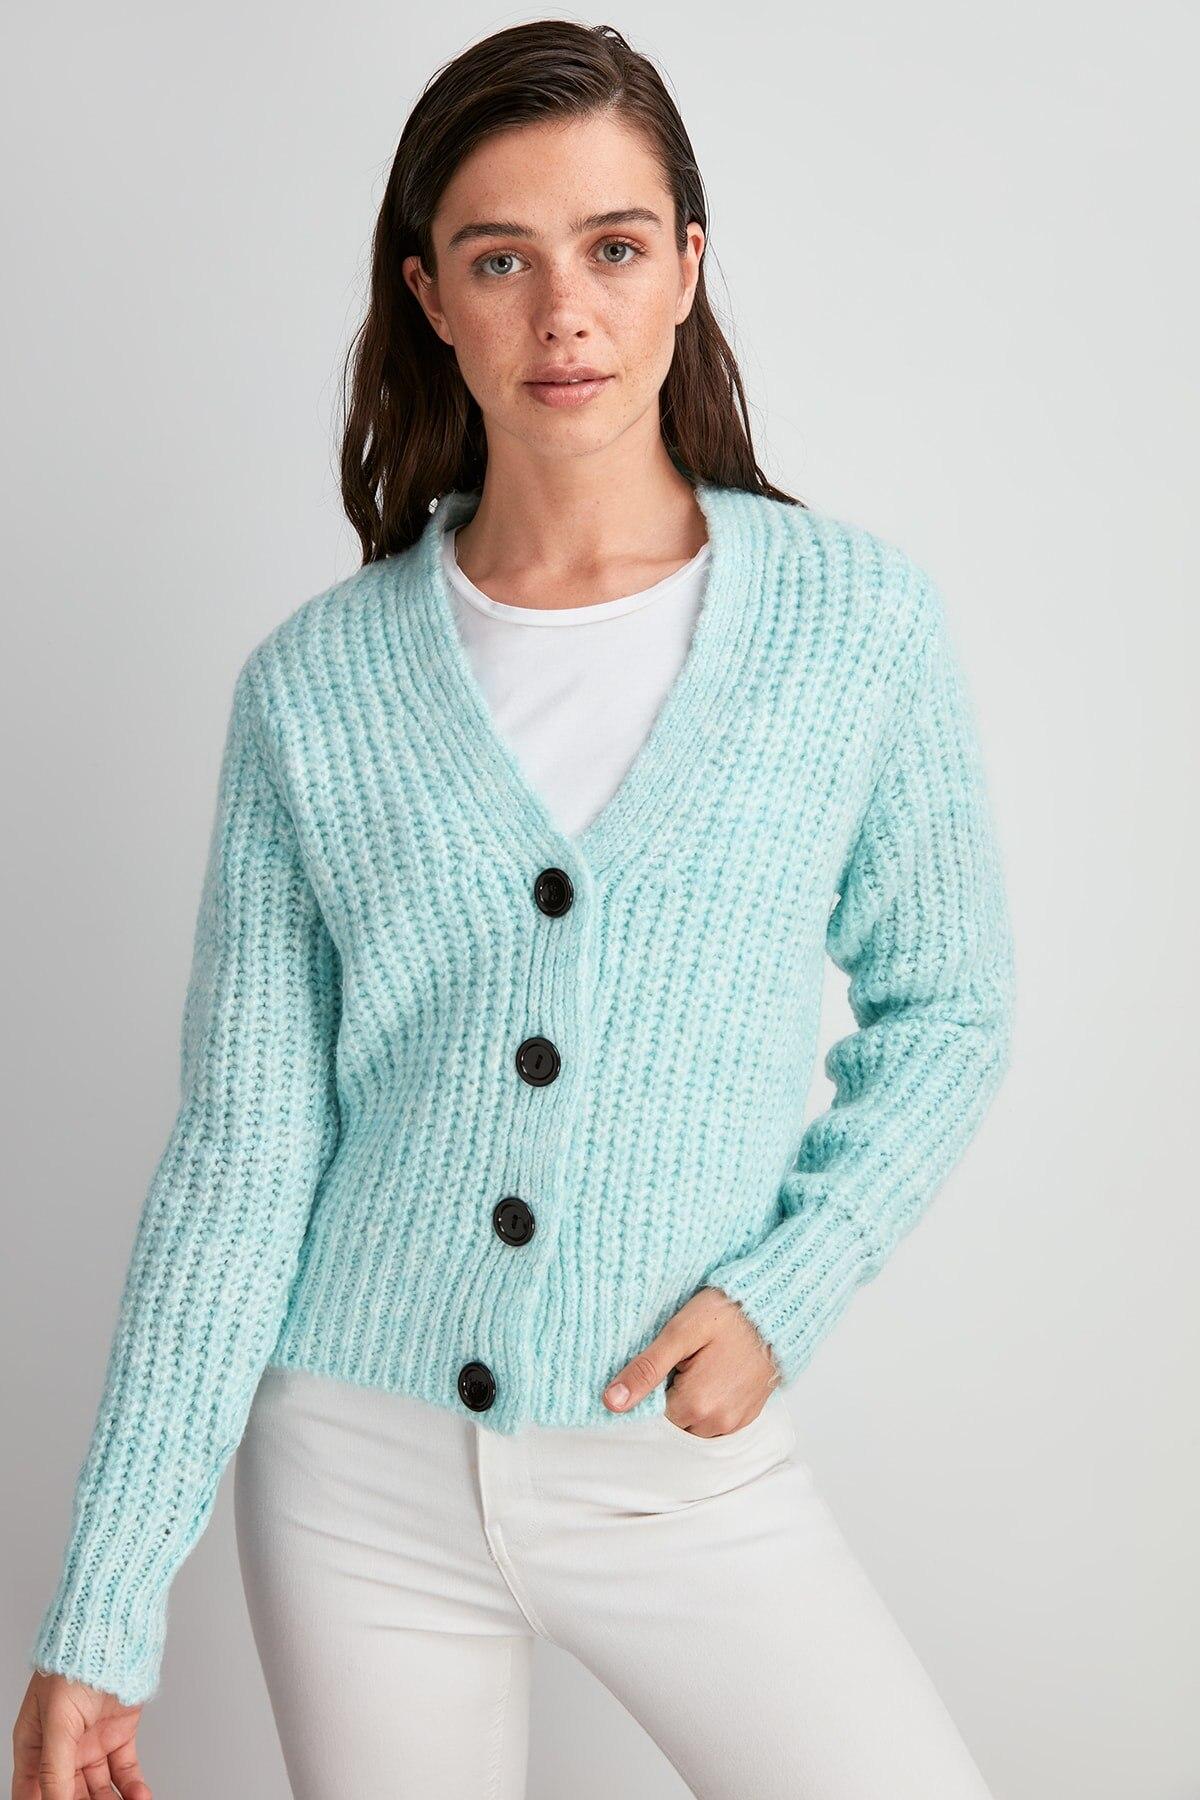 Trendyol Mesh Detailed Sweater Cardigan TWOAW20HI0214